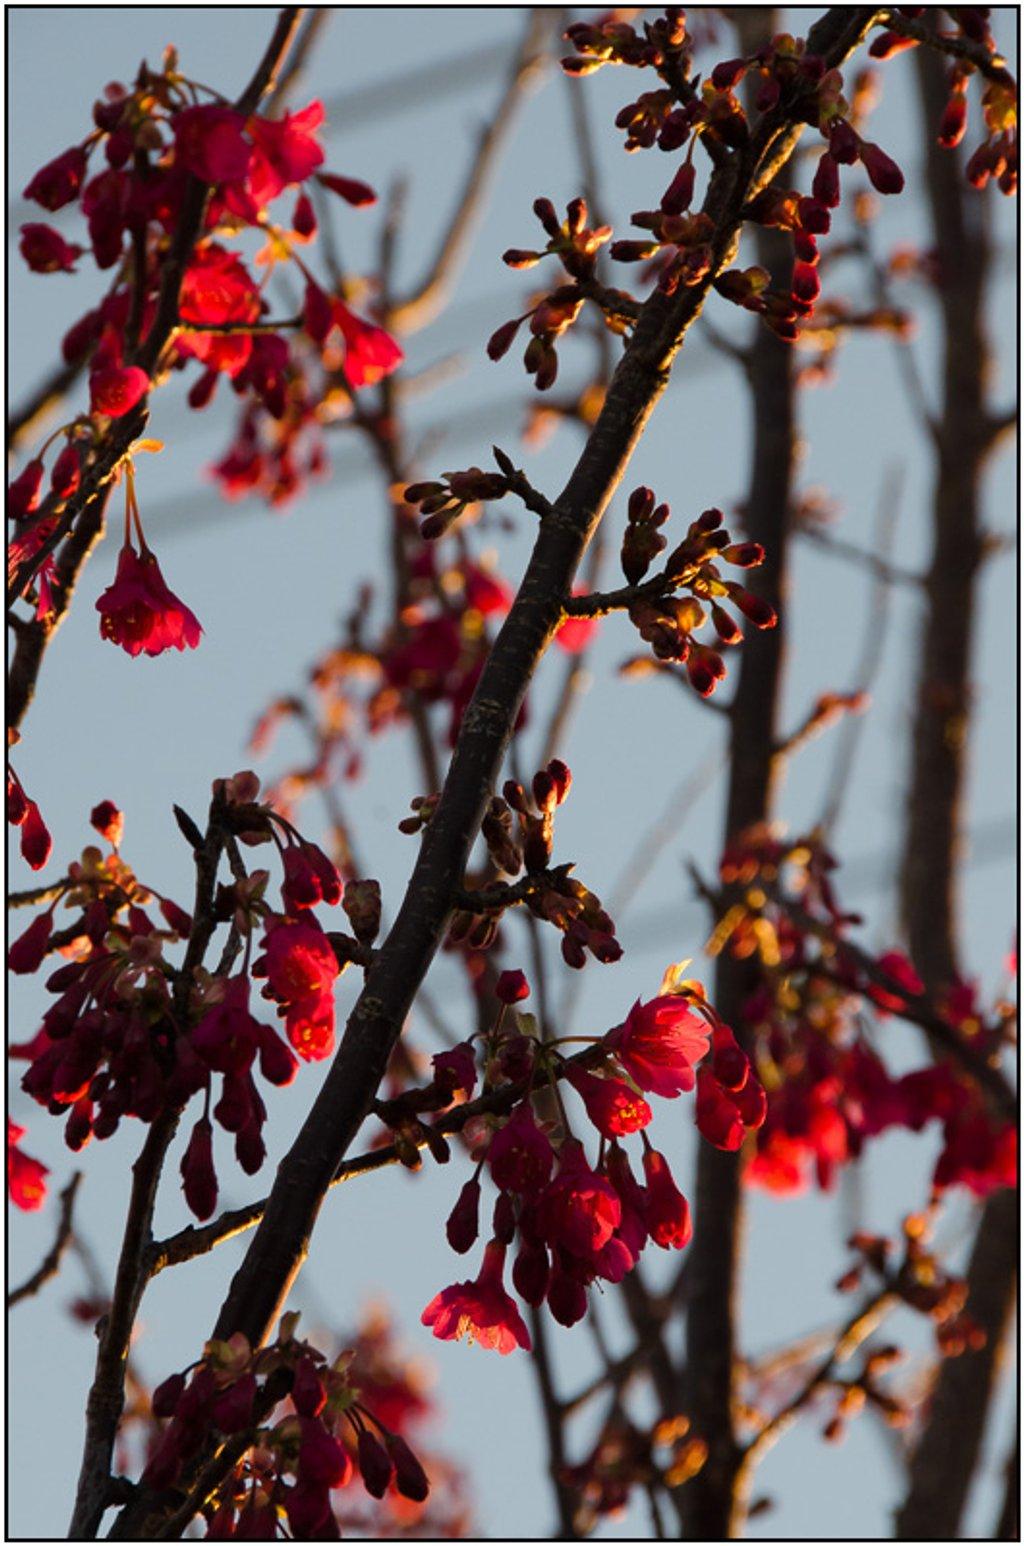 Winter Garden XII: New Cherry Blossom by chikadnz